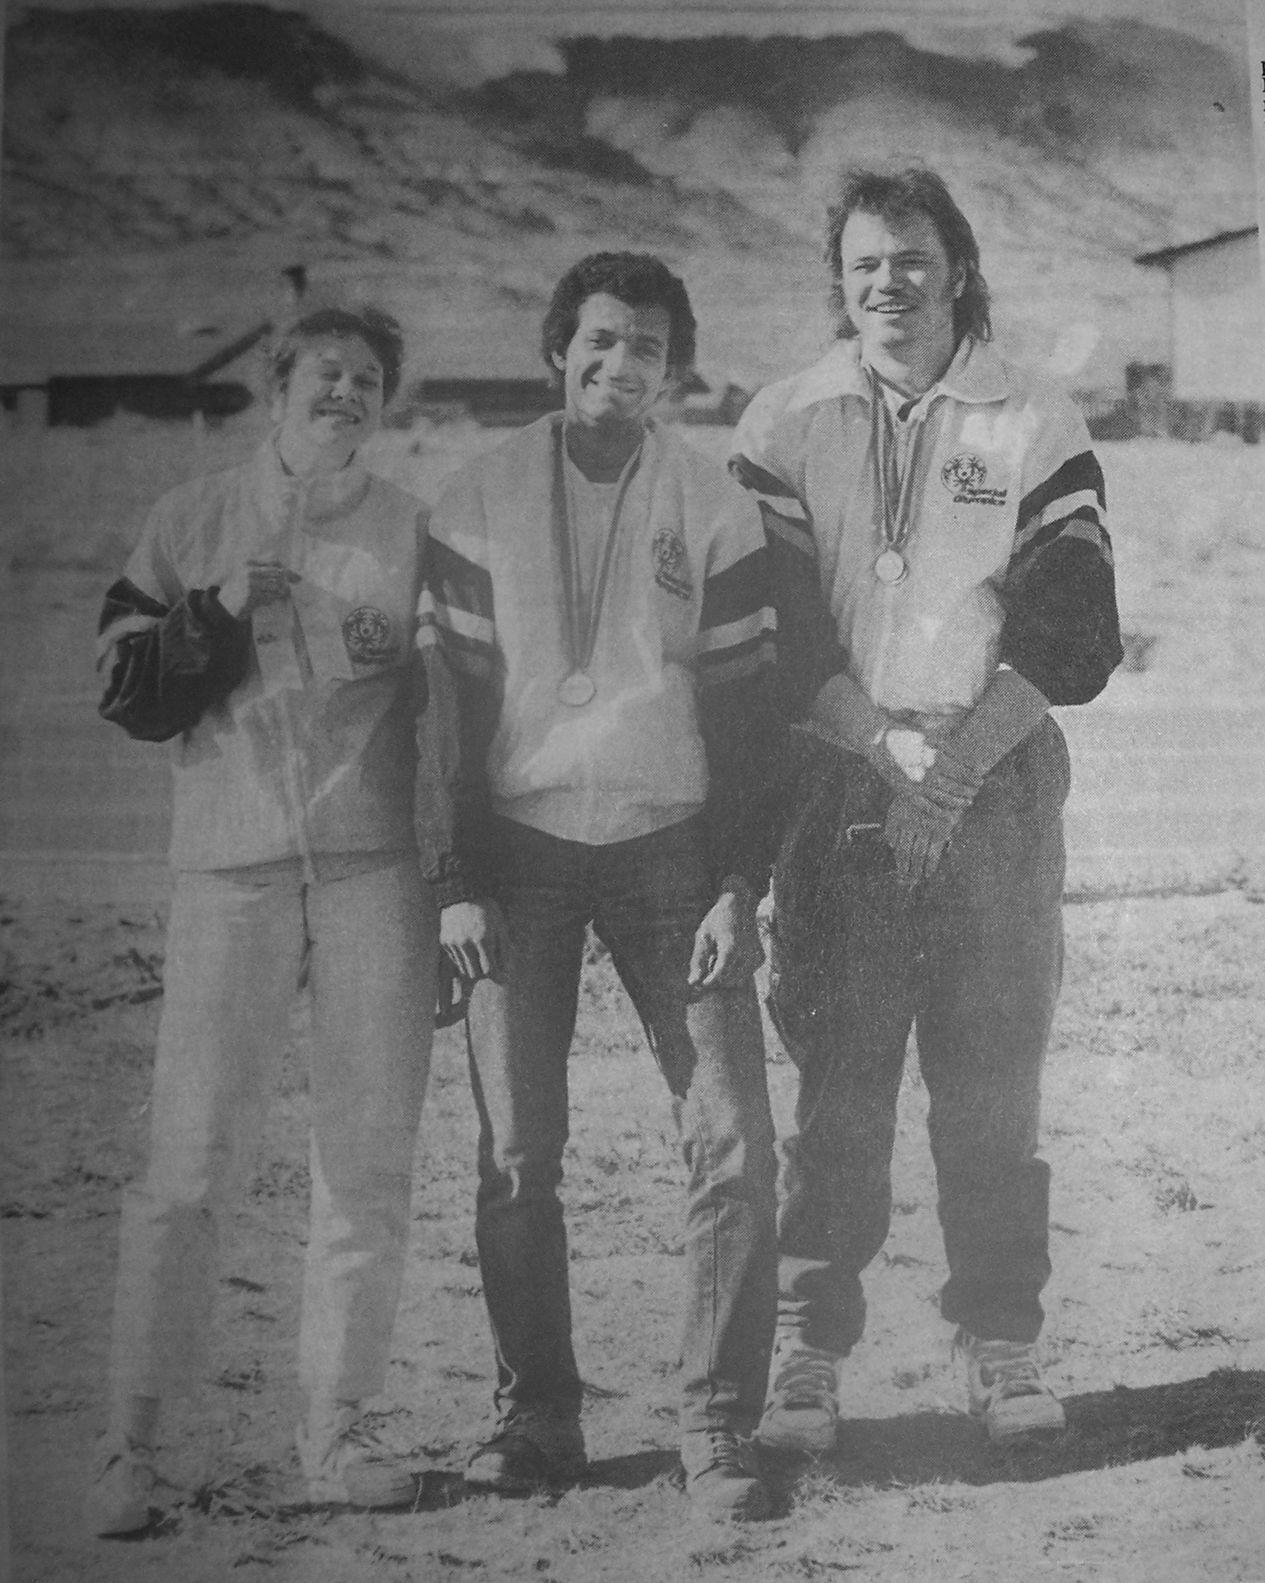 Melinda Roundy, Jeff King and Bert Zickefoose